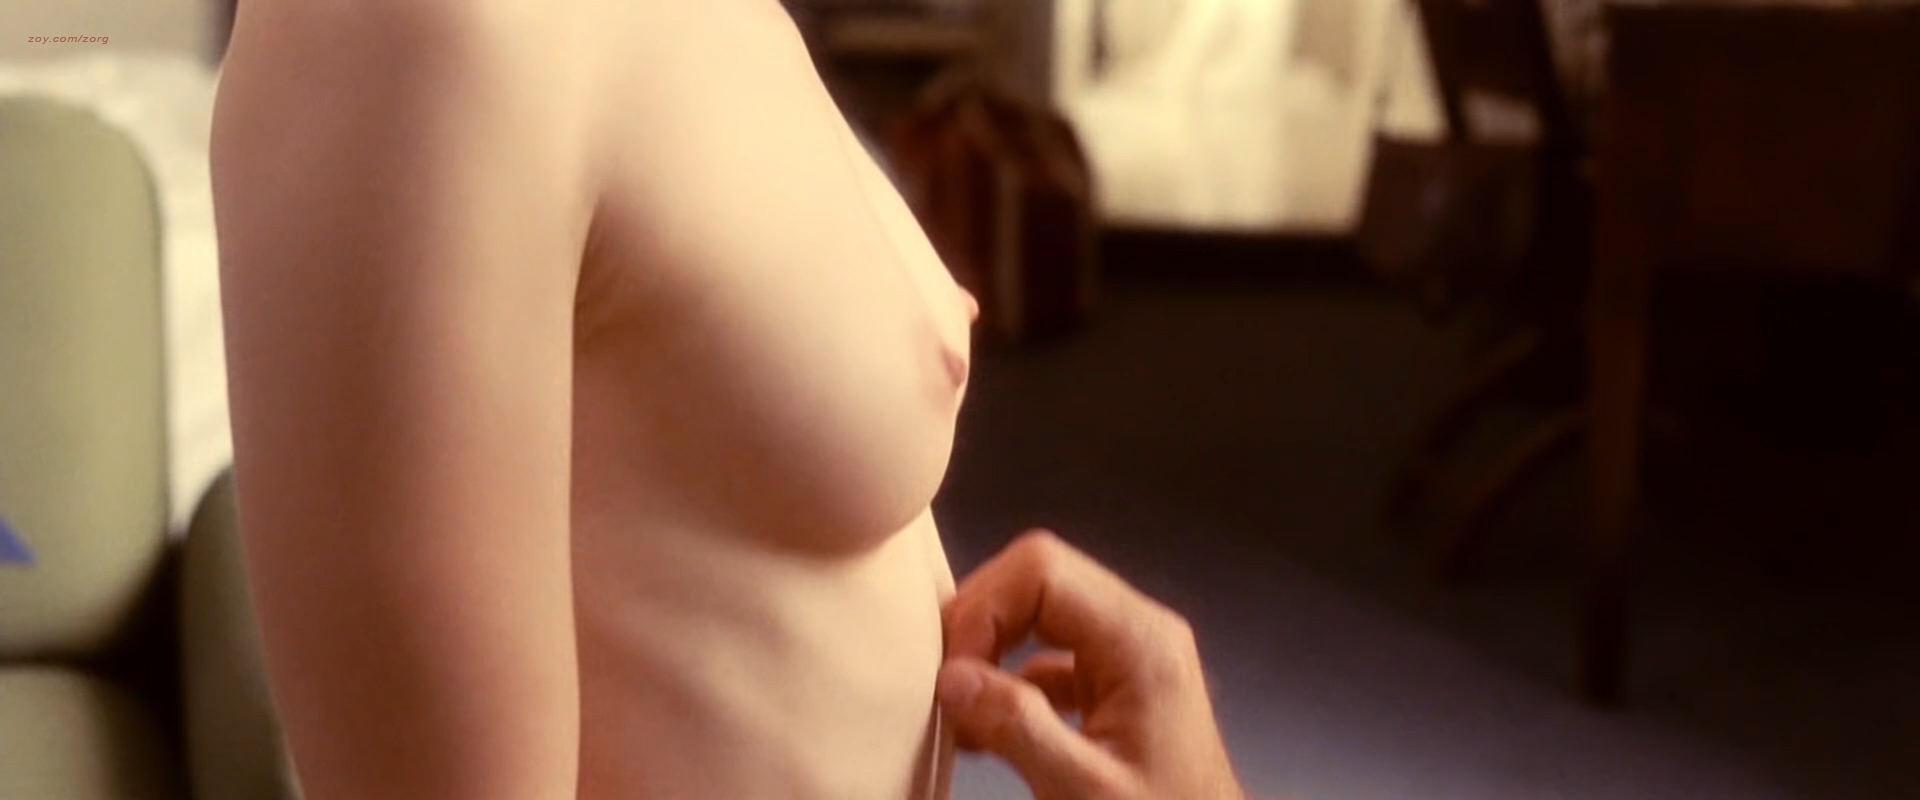 Dillan Arrick  nackt